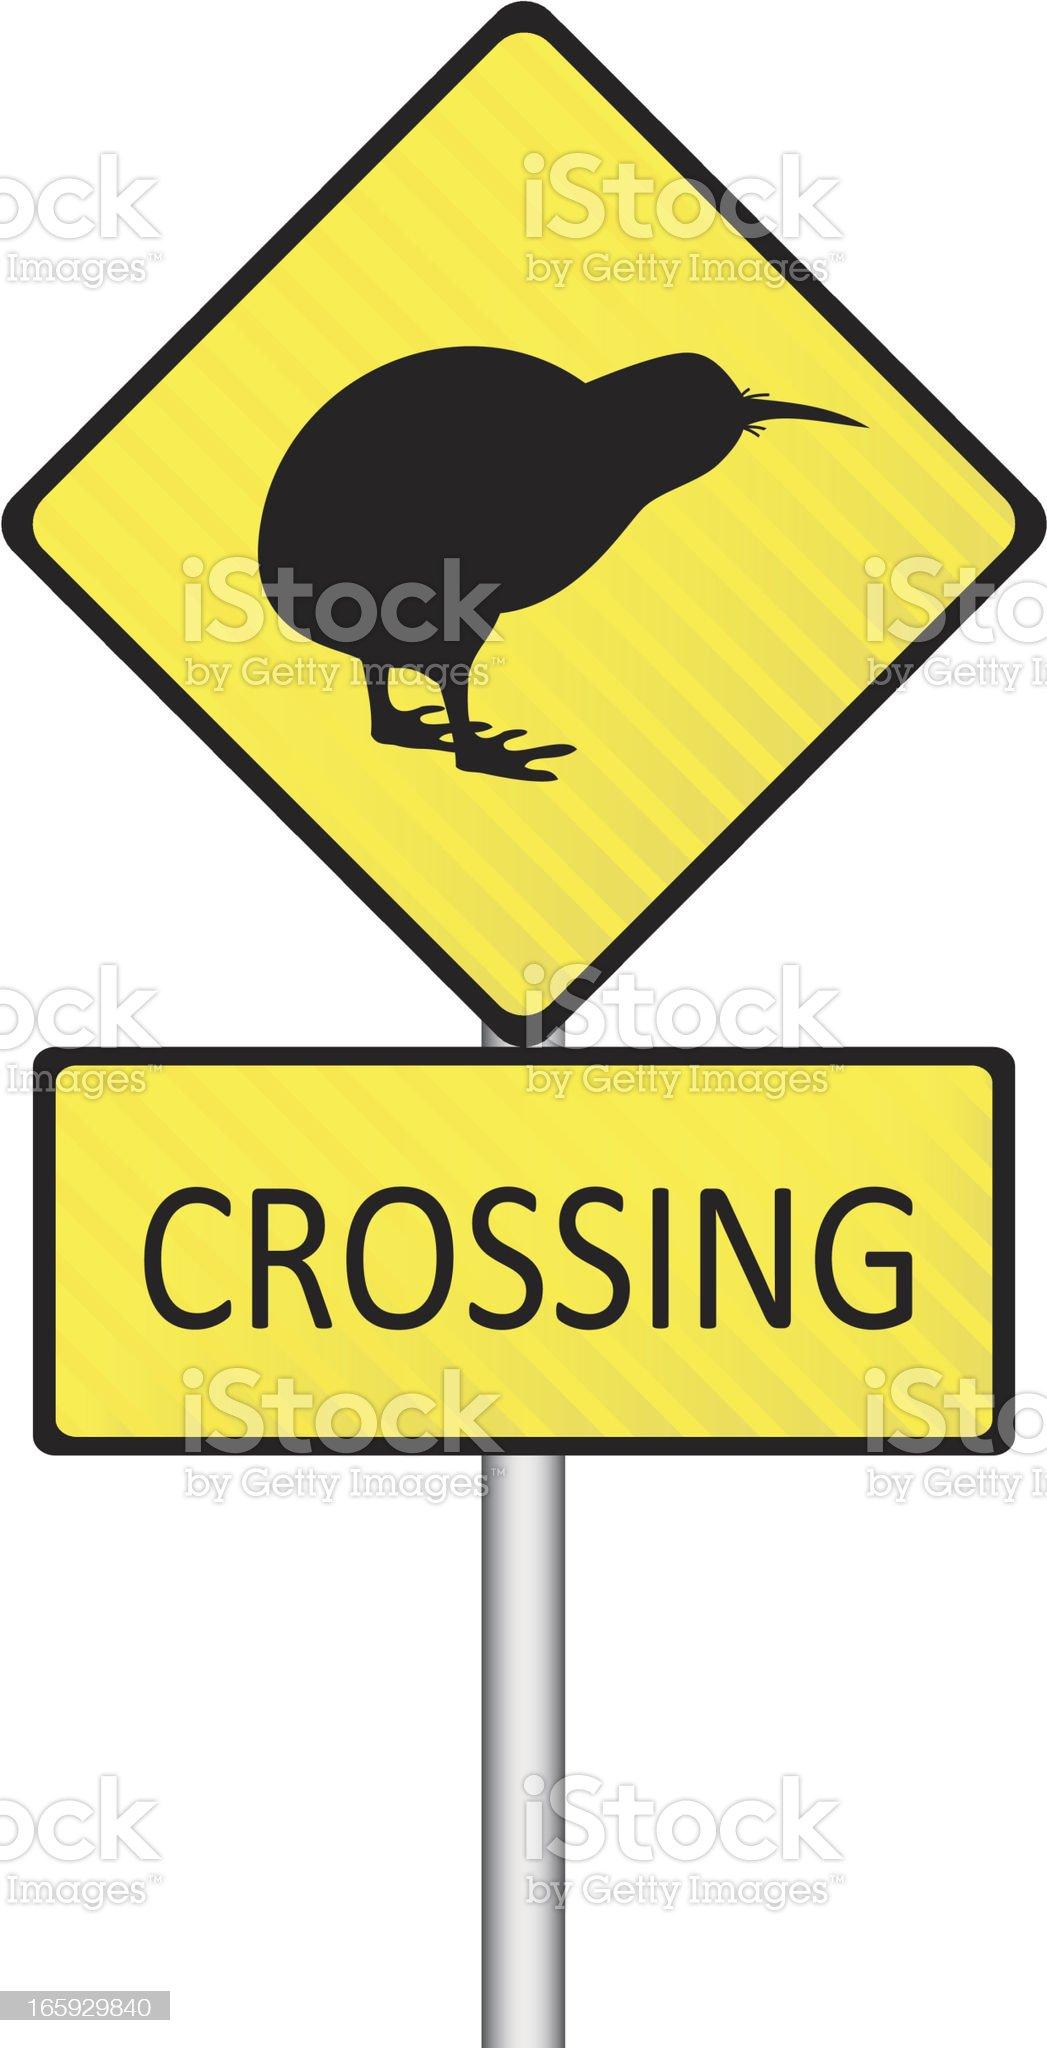 Kiwi Crossing Road Sign royalty-free stock vector art